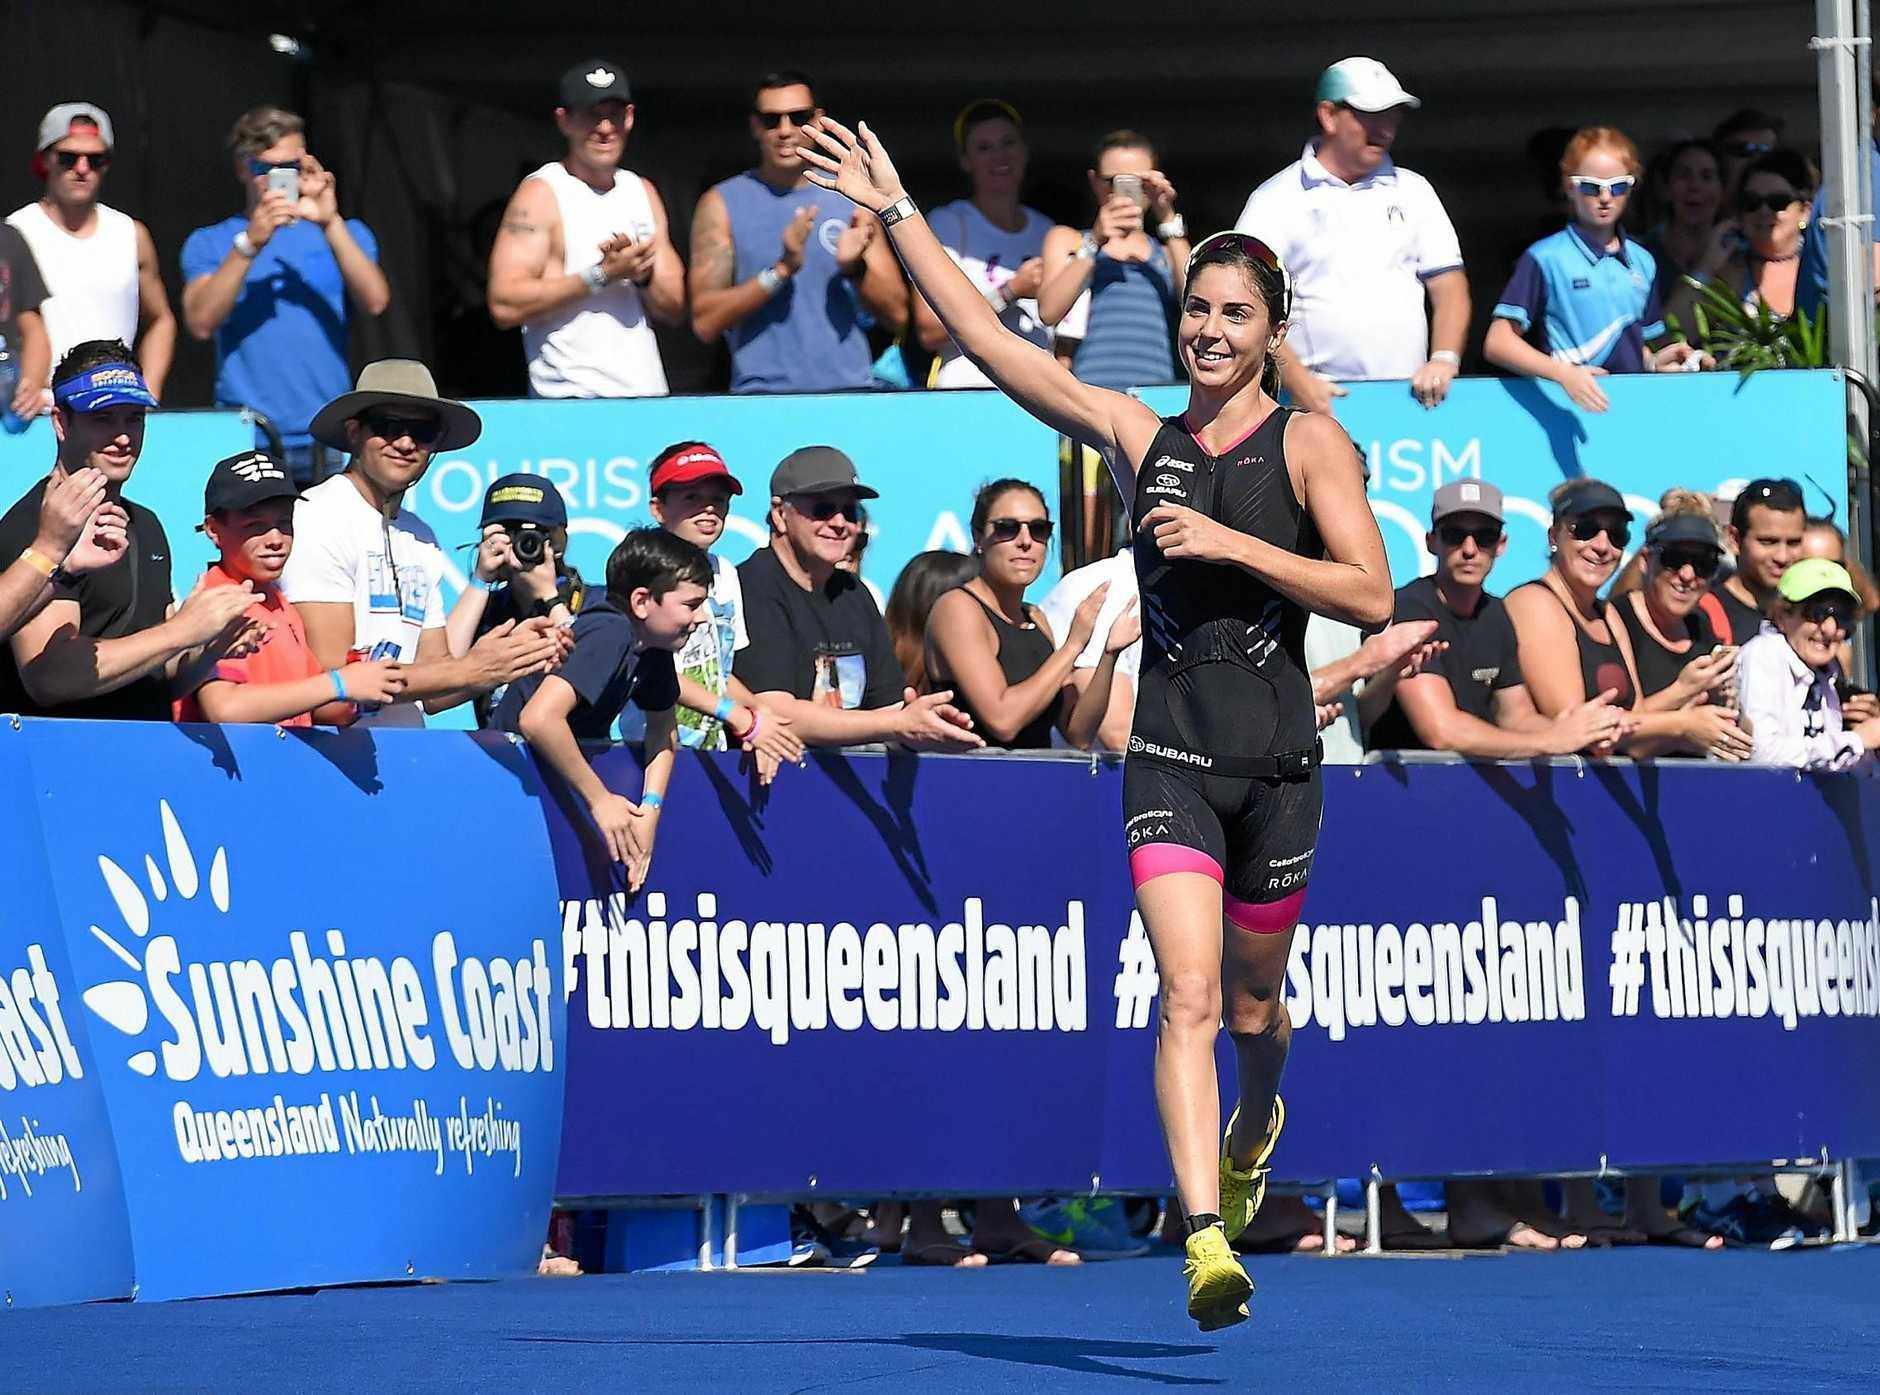 GENTLE DOES IT: Ashleigh Gentle celebrates winning the Noosa Triathlon in 2016. This year's Noosa Triathlon Multi-Sport Festival runs across this weekend.